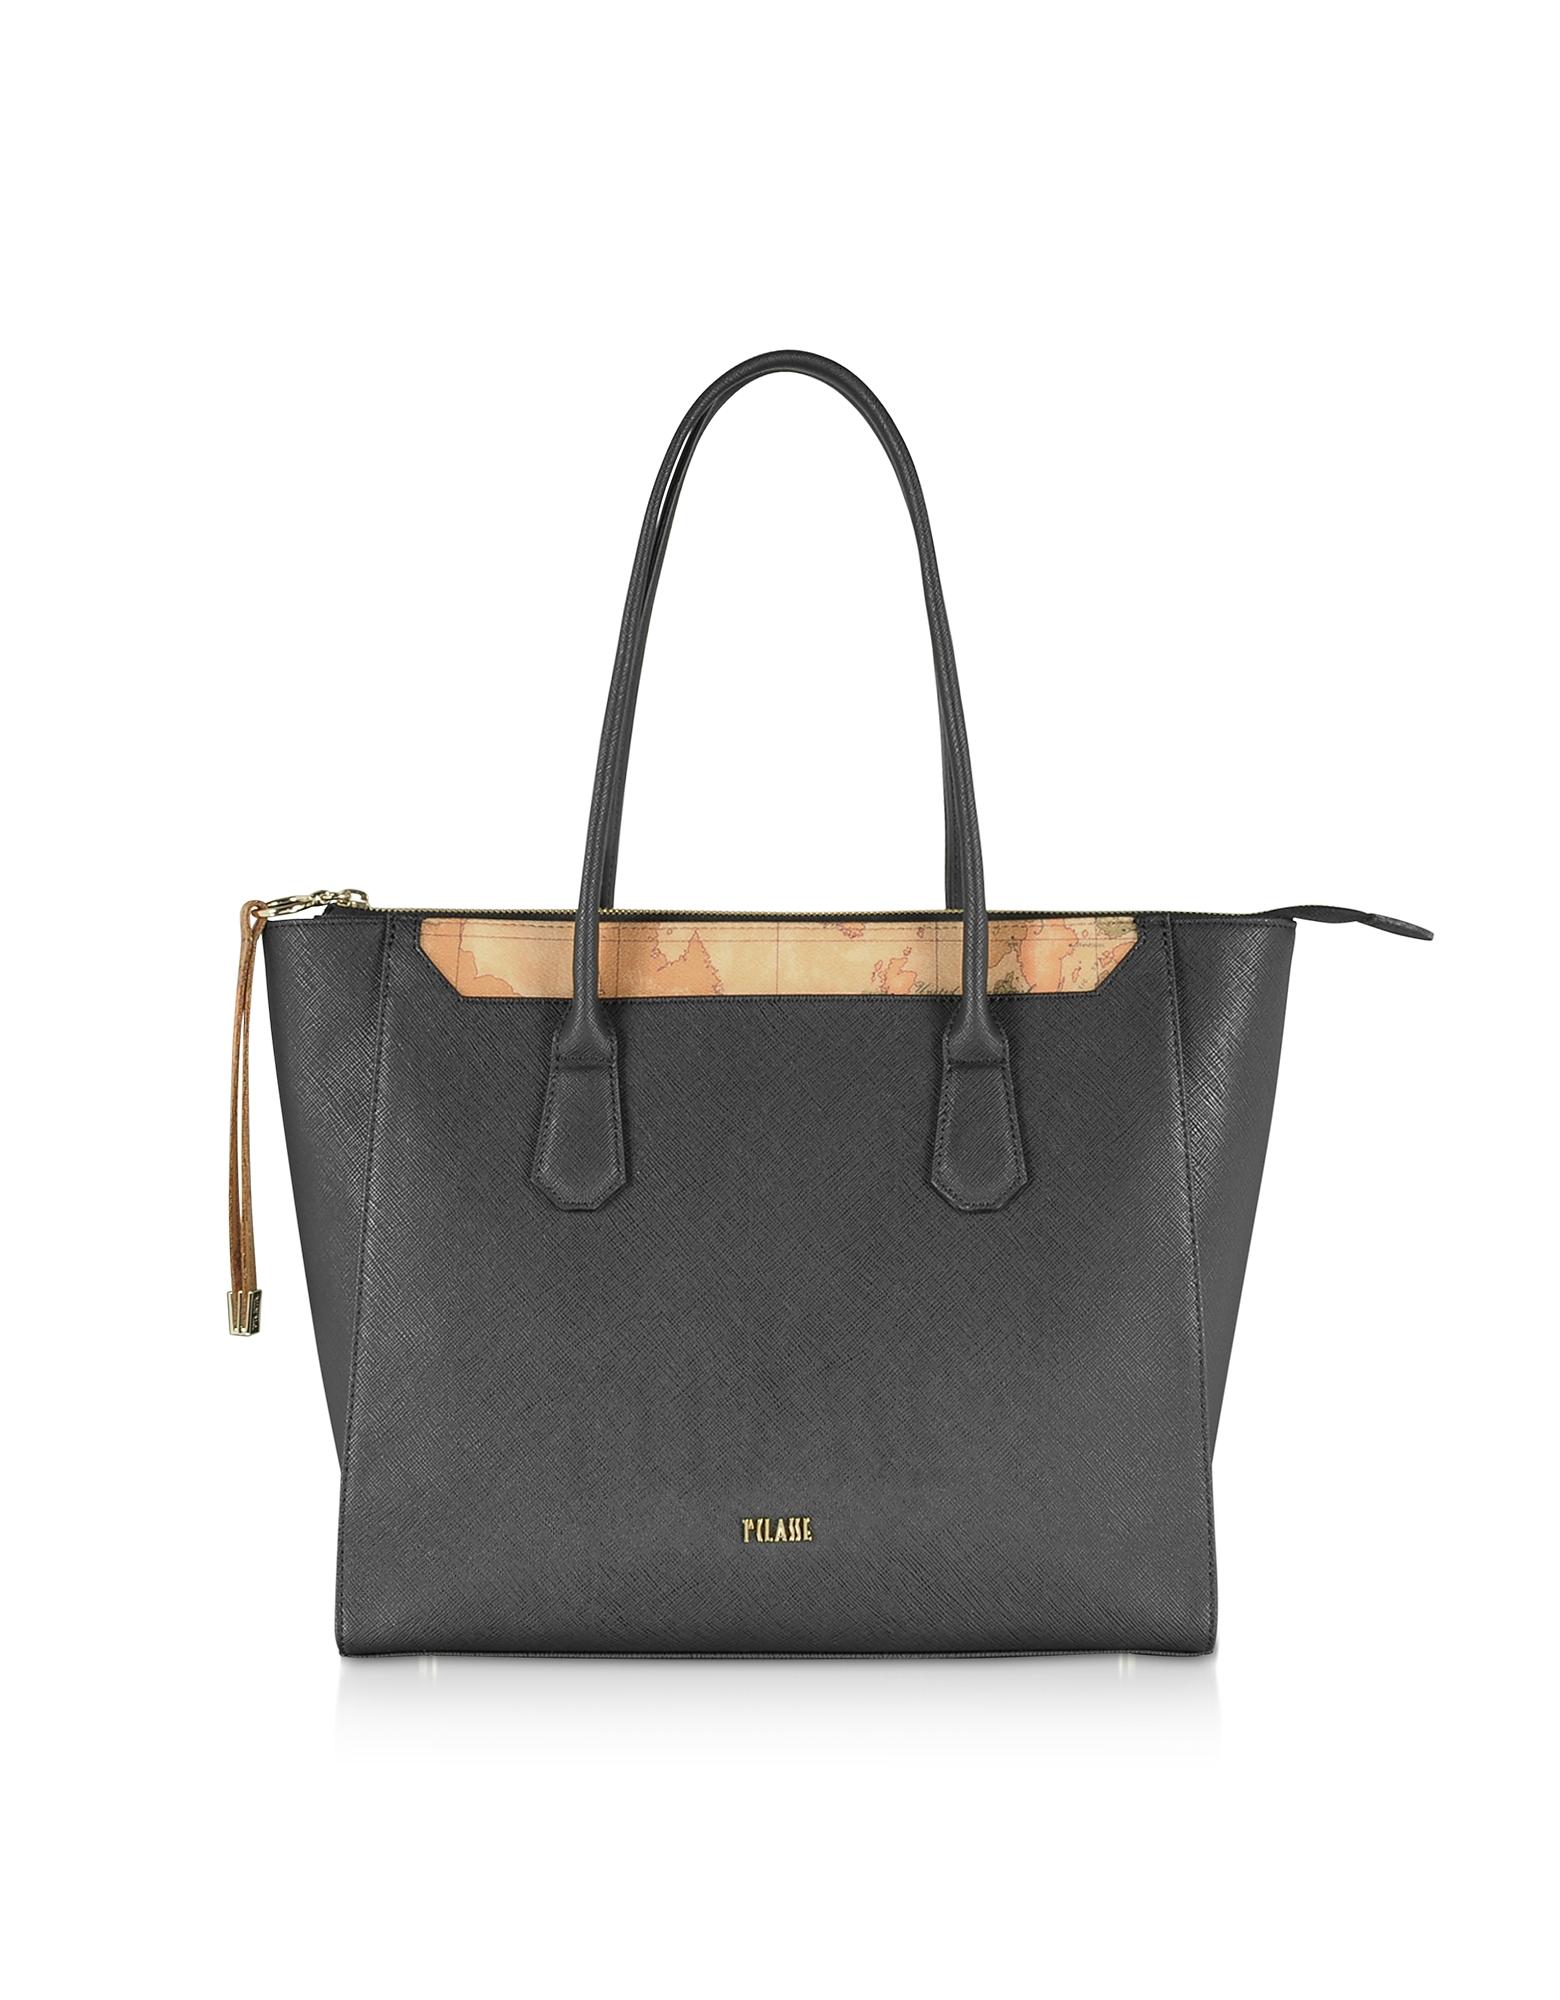 Alviero Martini 1A Classe Designer Handbags, Black Tote Bag w/ Geo Print Details